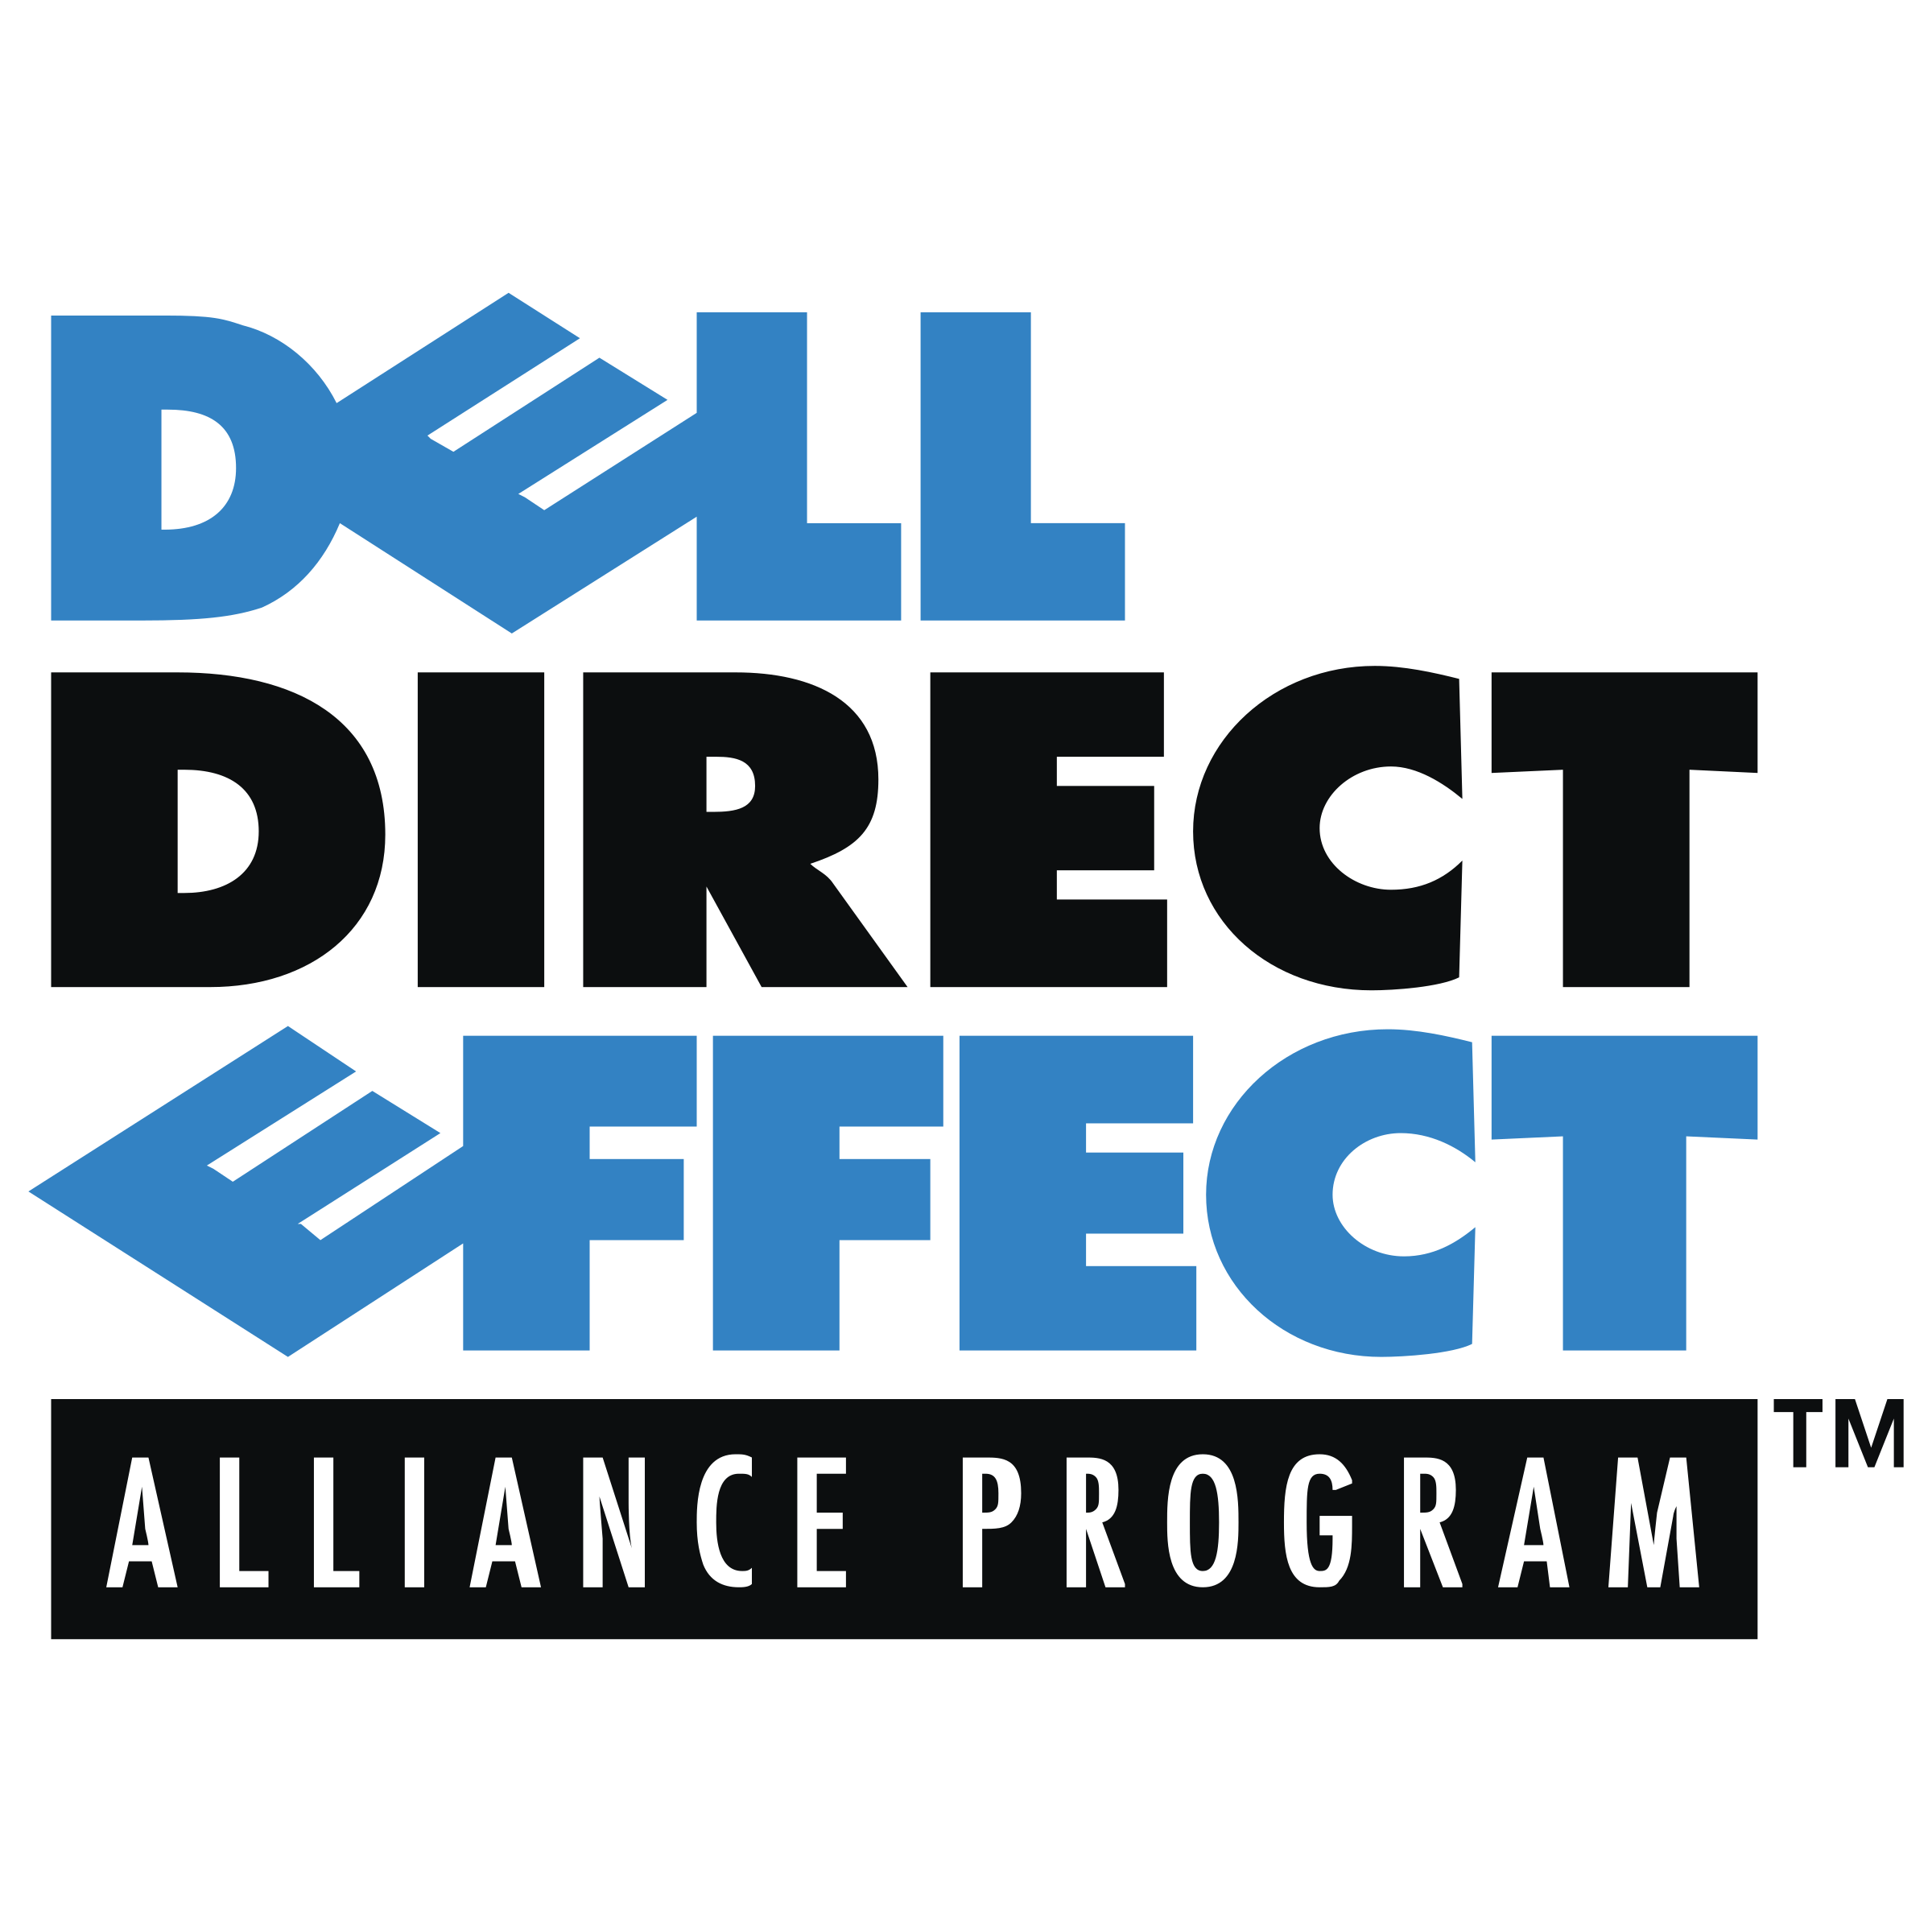 Dell Direct Effect Logo PNG Transparent & SVG Vector